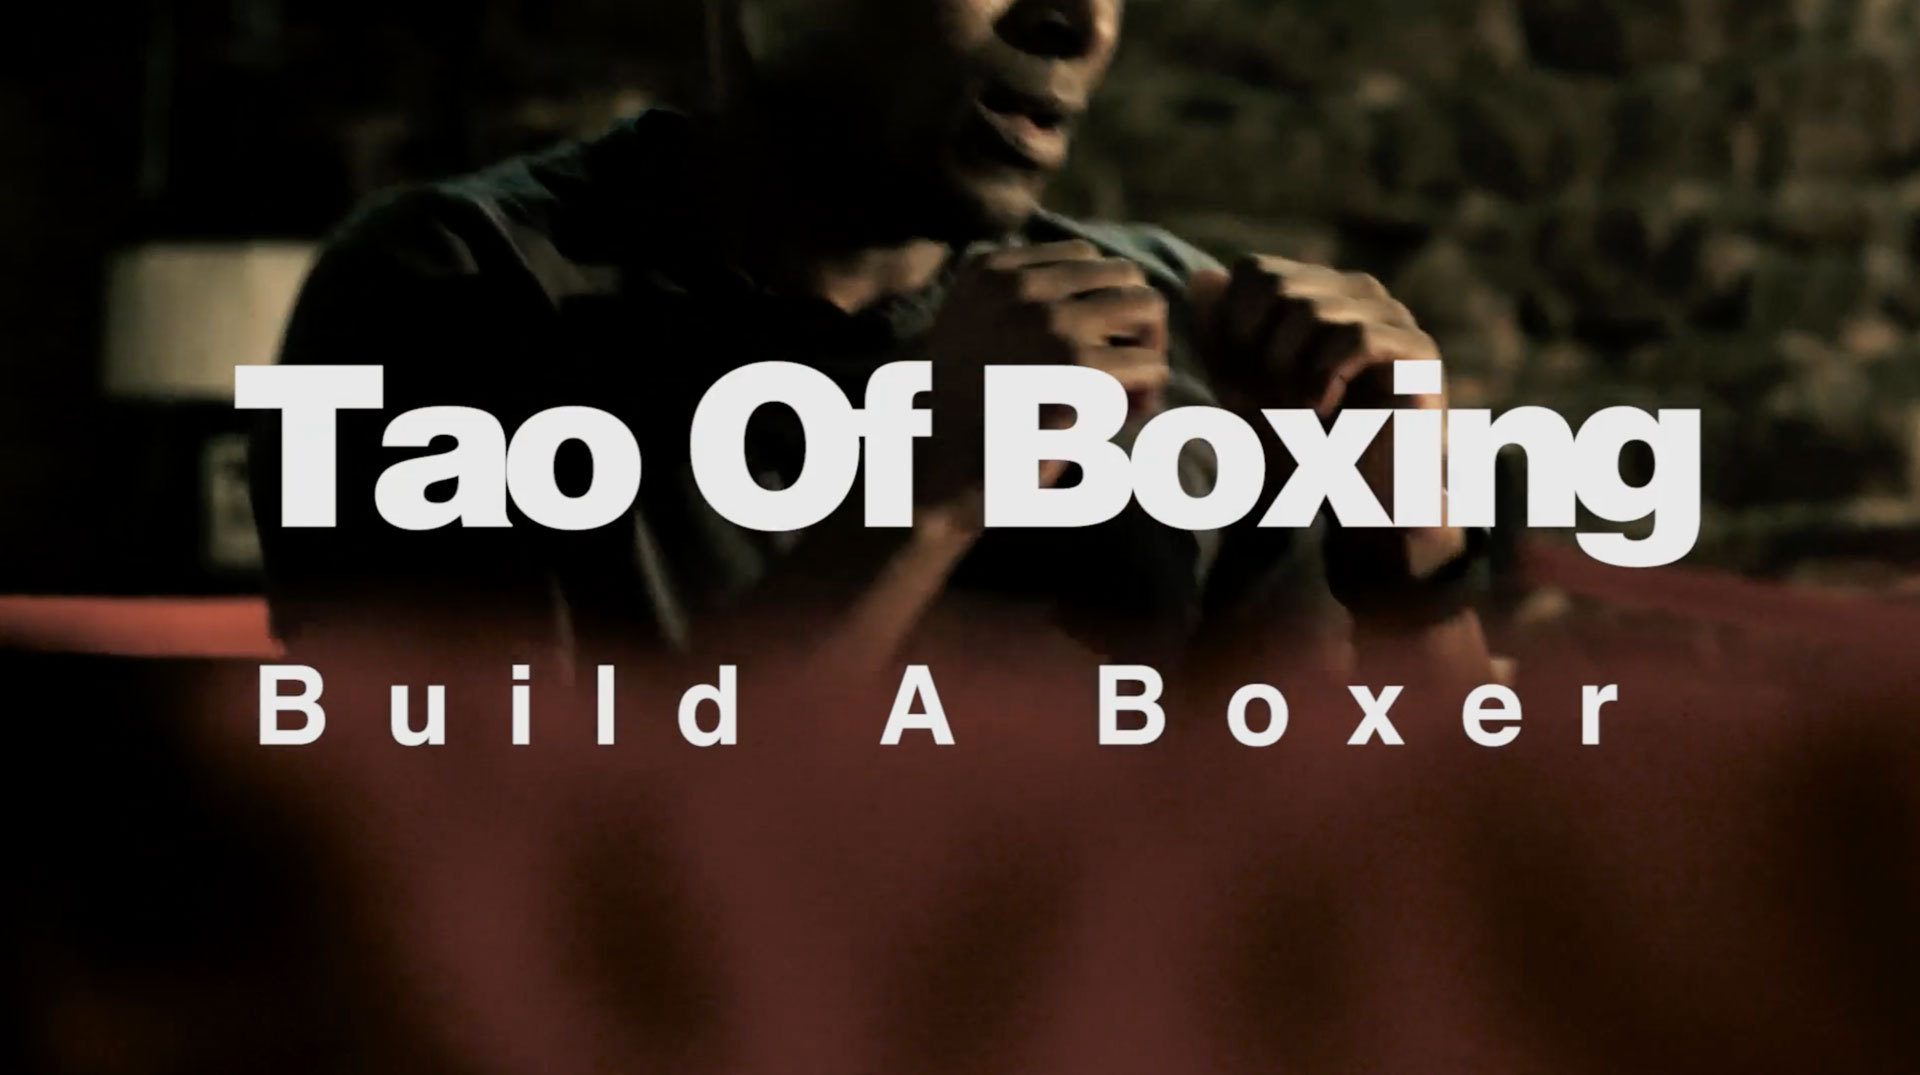 Tao of Boxing Titles